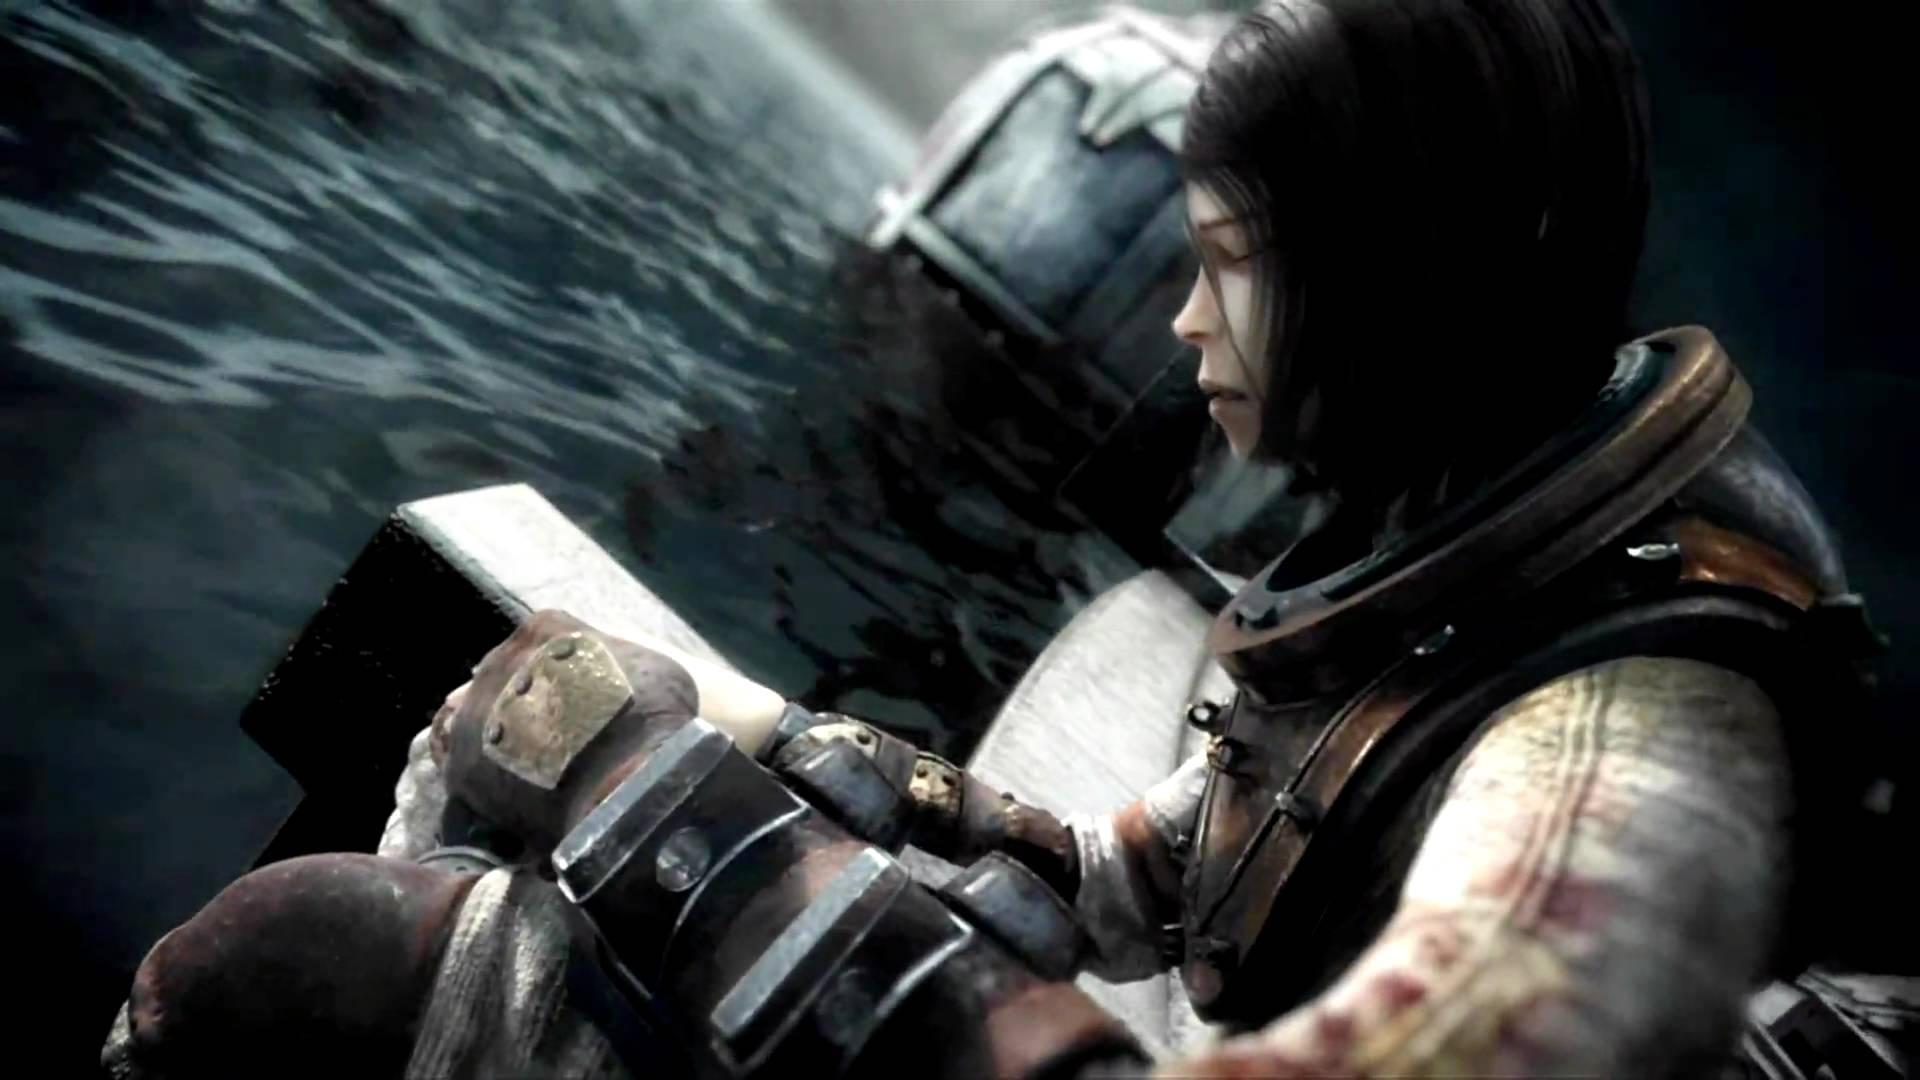 Bioshock Infinite Wallpaper Quote Bioshock 2 S Neutral Ending Is The Best Ending Gameluster